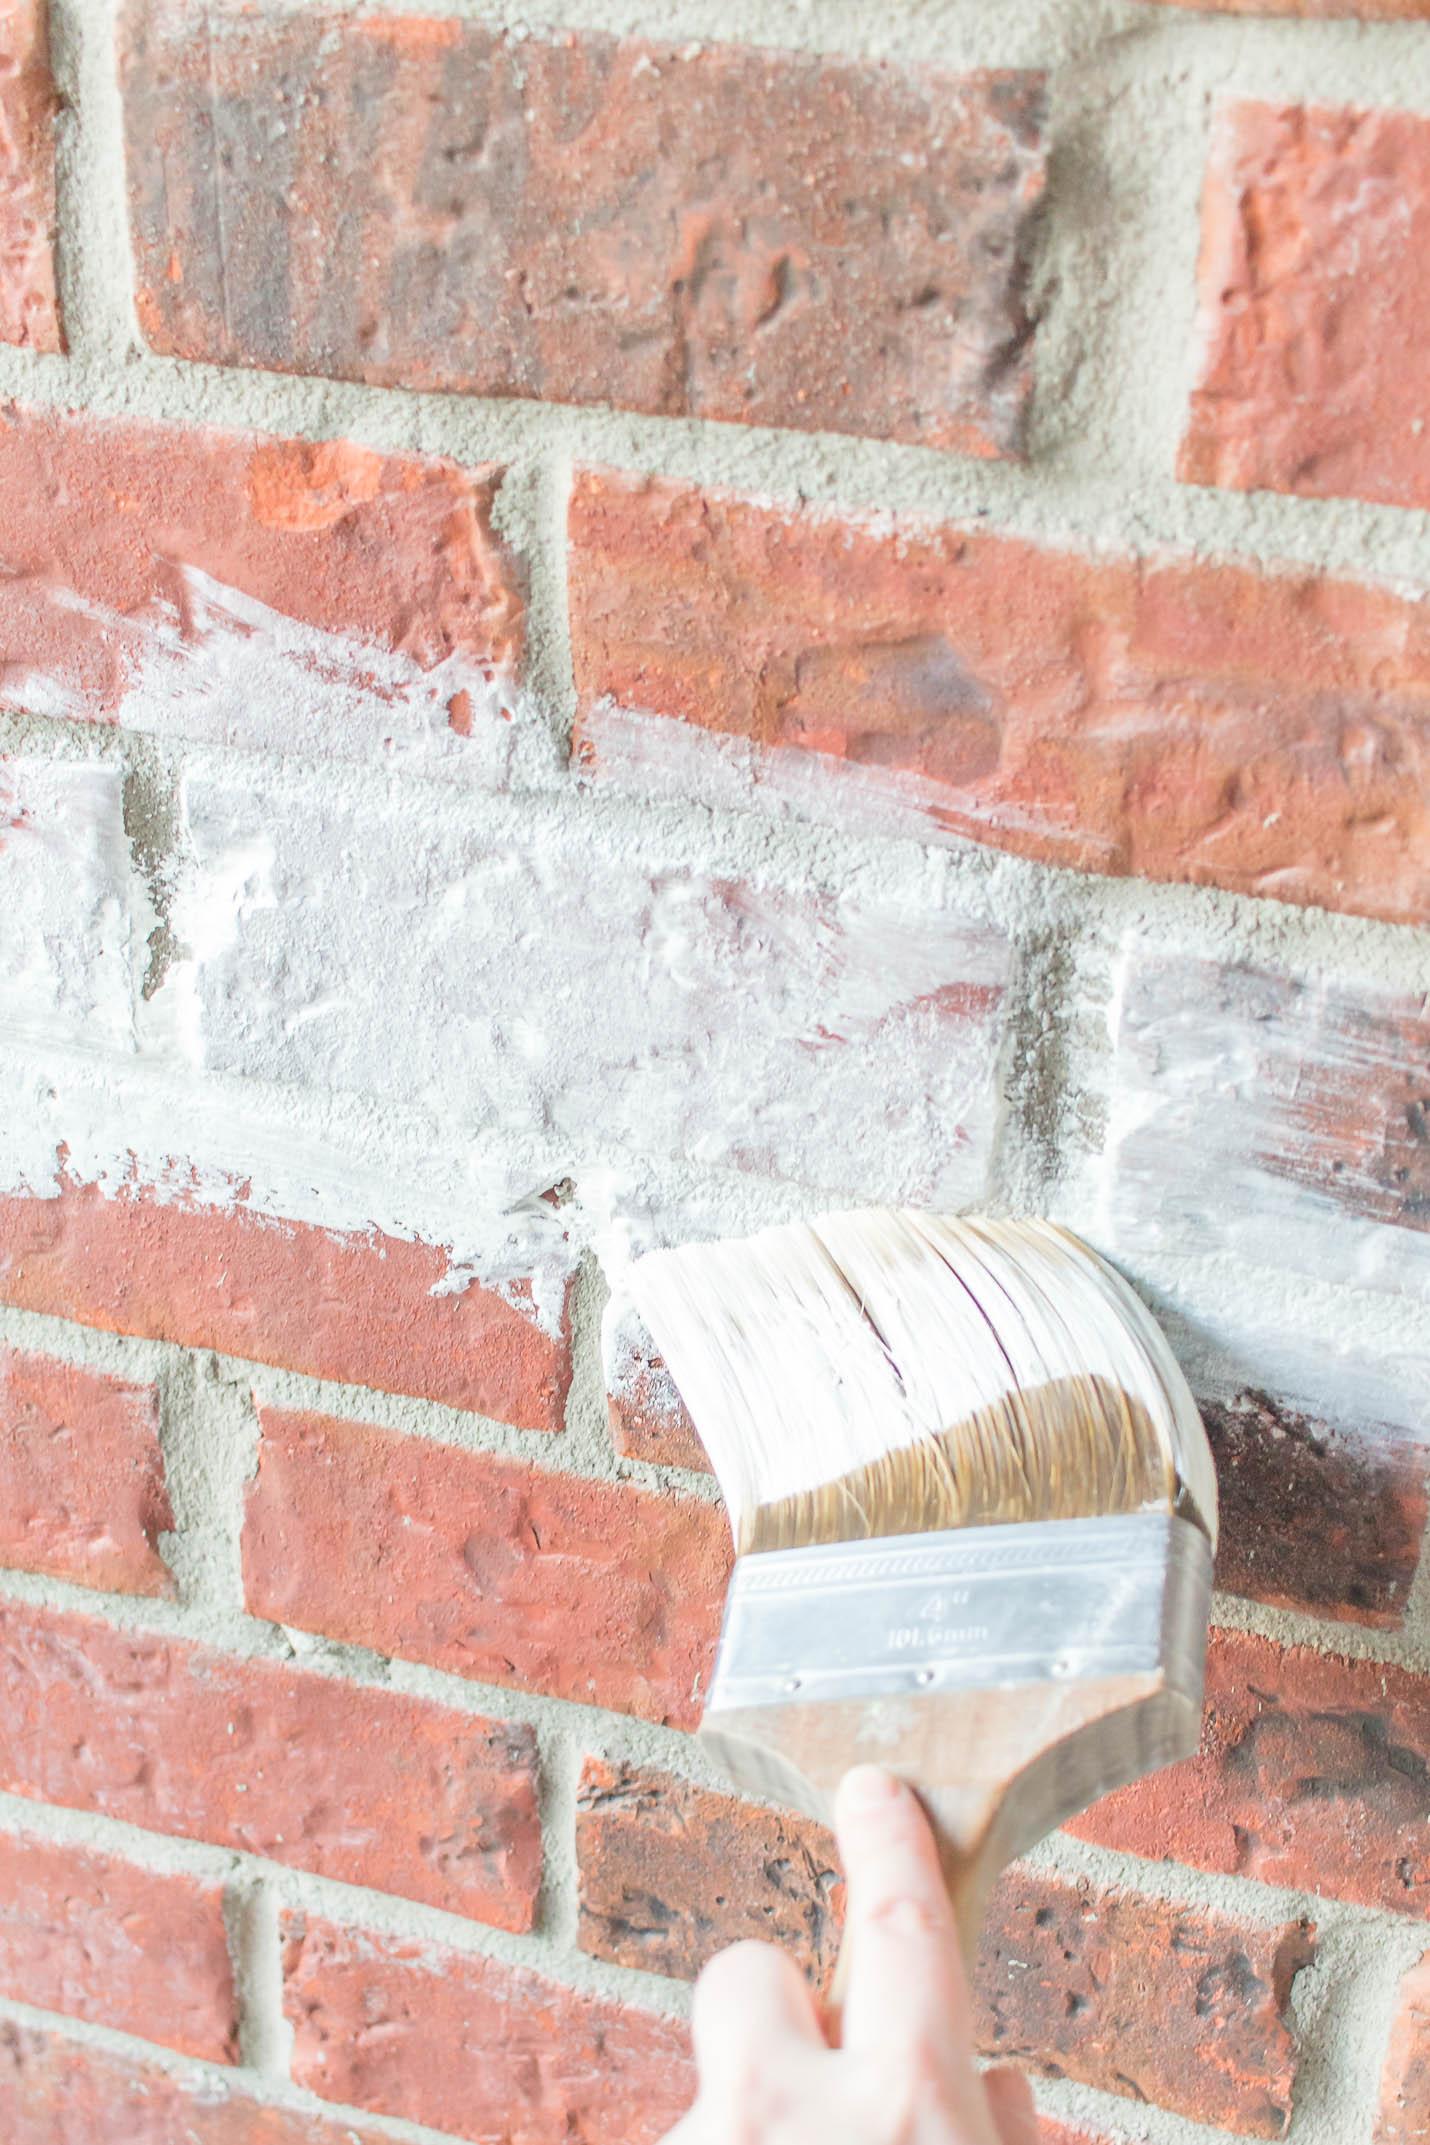 How To Whitewash Brick Authentic Diy Recipe